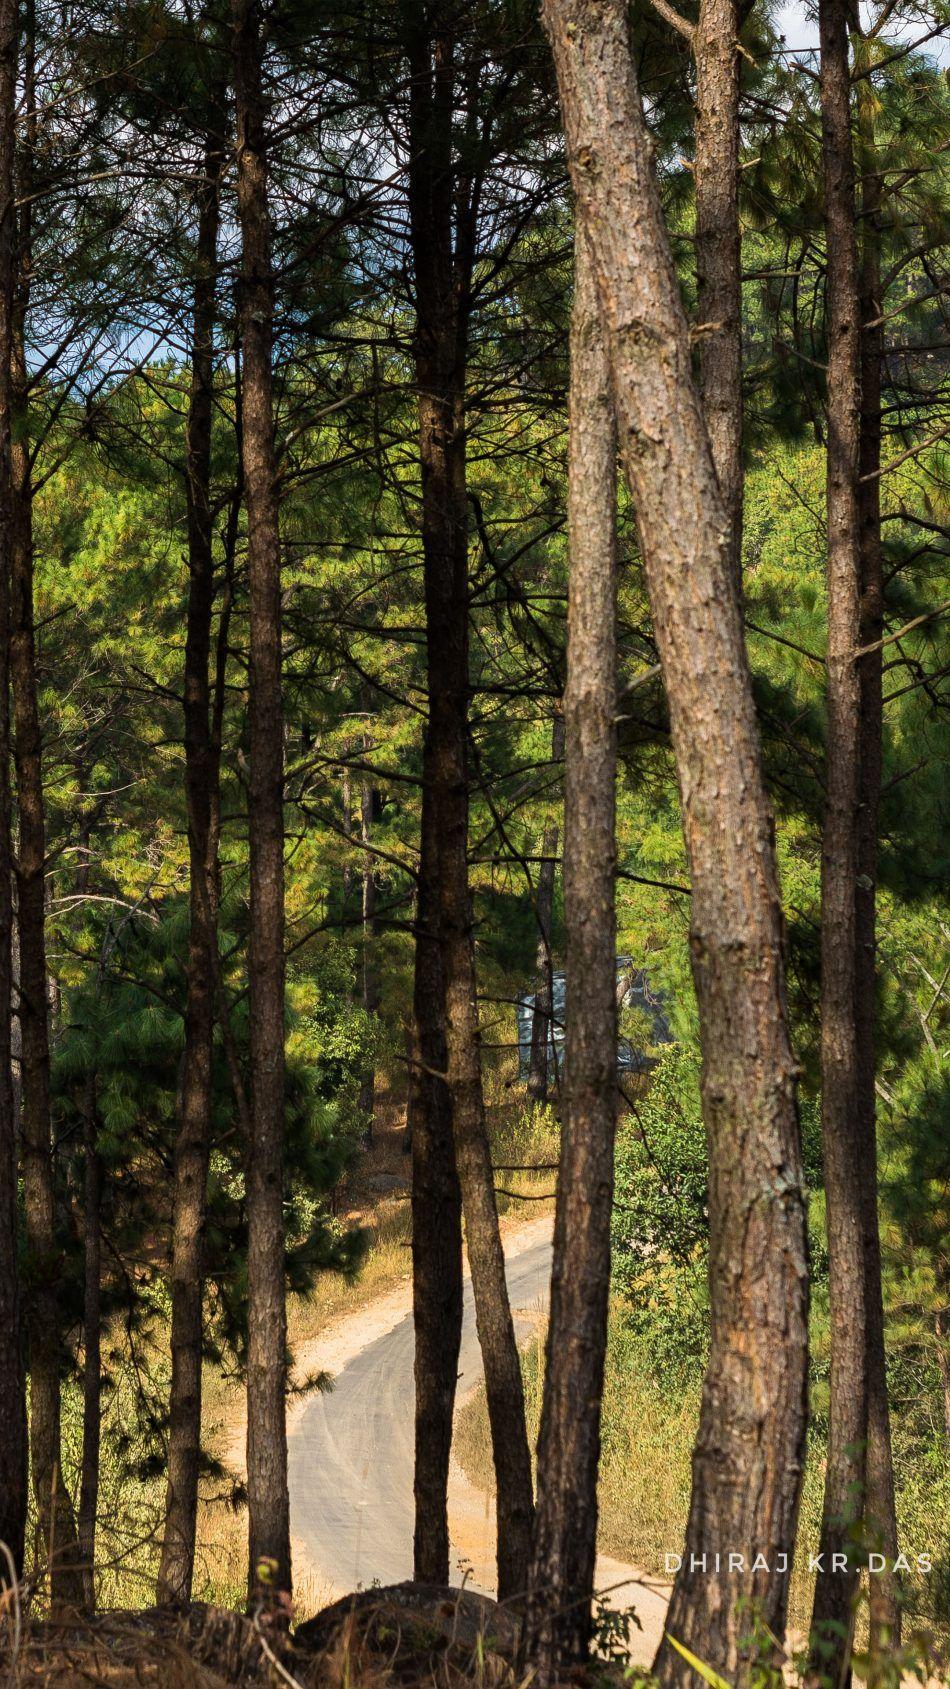 Trees Forest Road Meghalaya 4k Ultra Hd Mobile Wallpaper Forest Road Tree Forest Forest Wallpaper